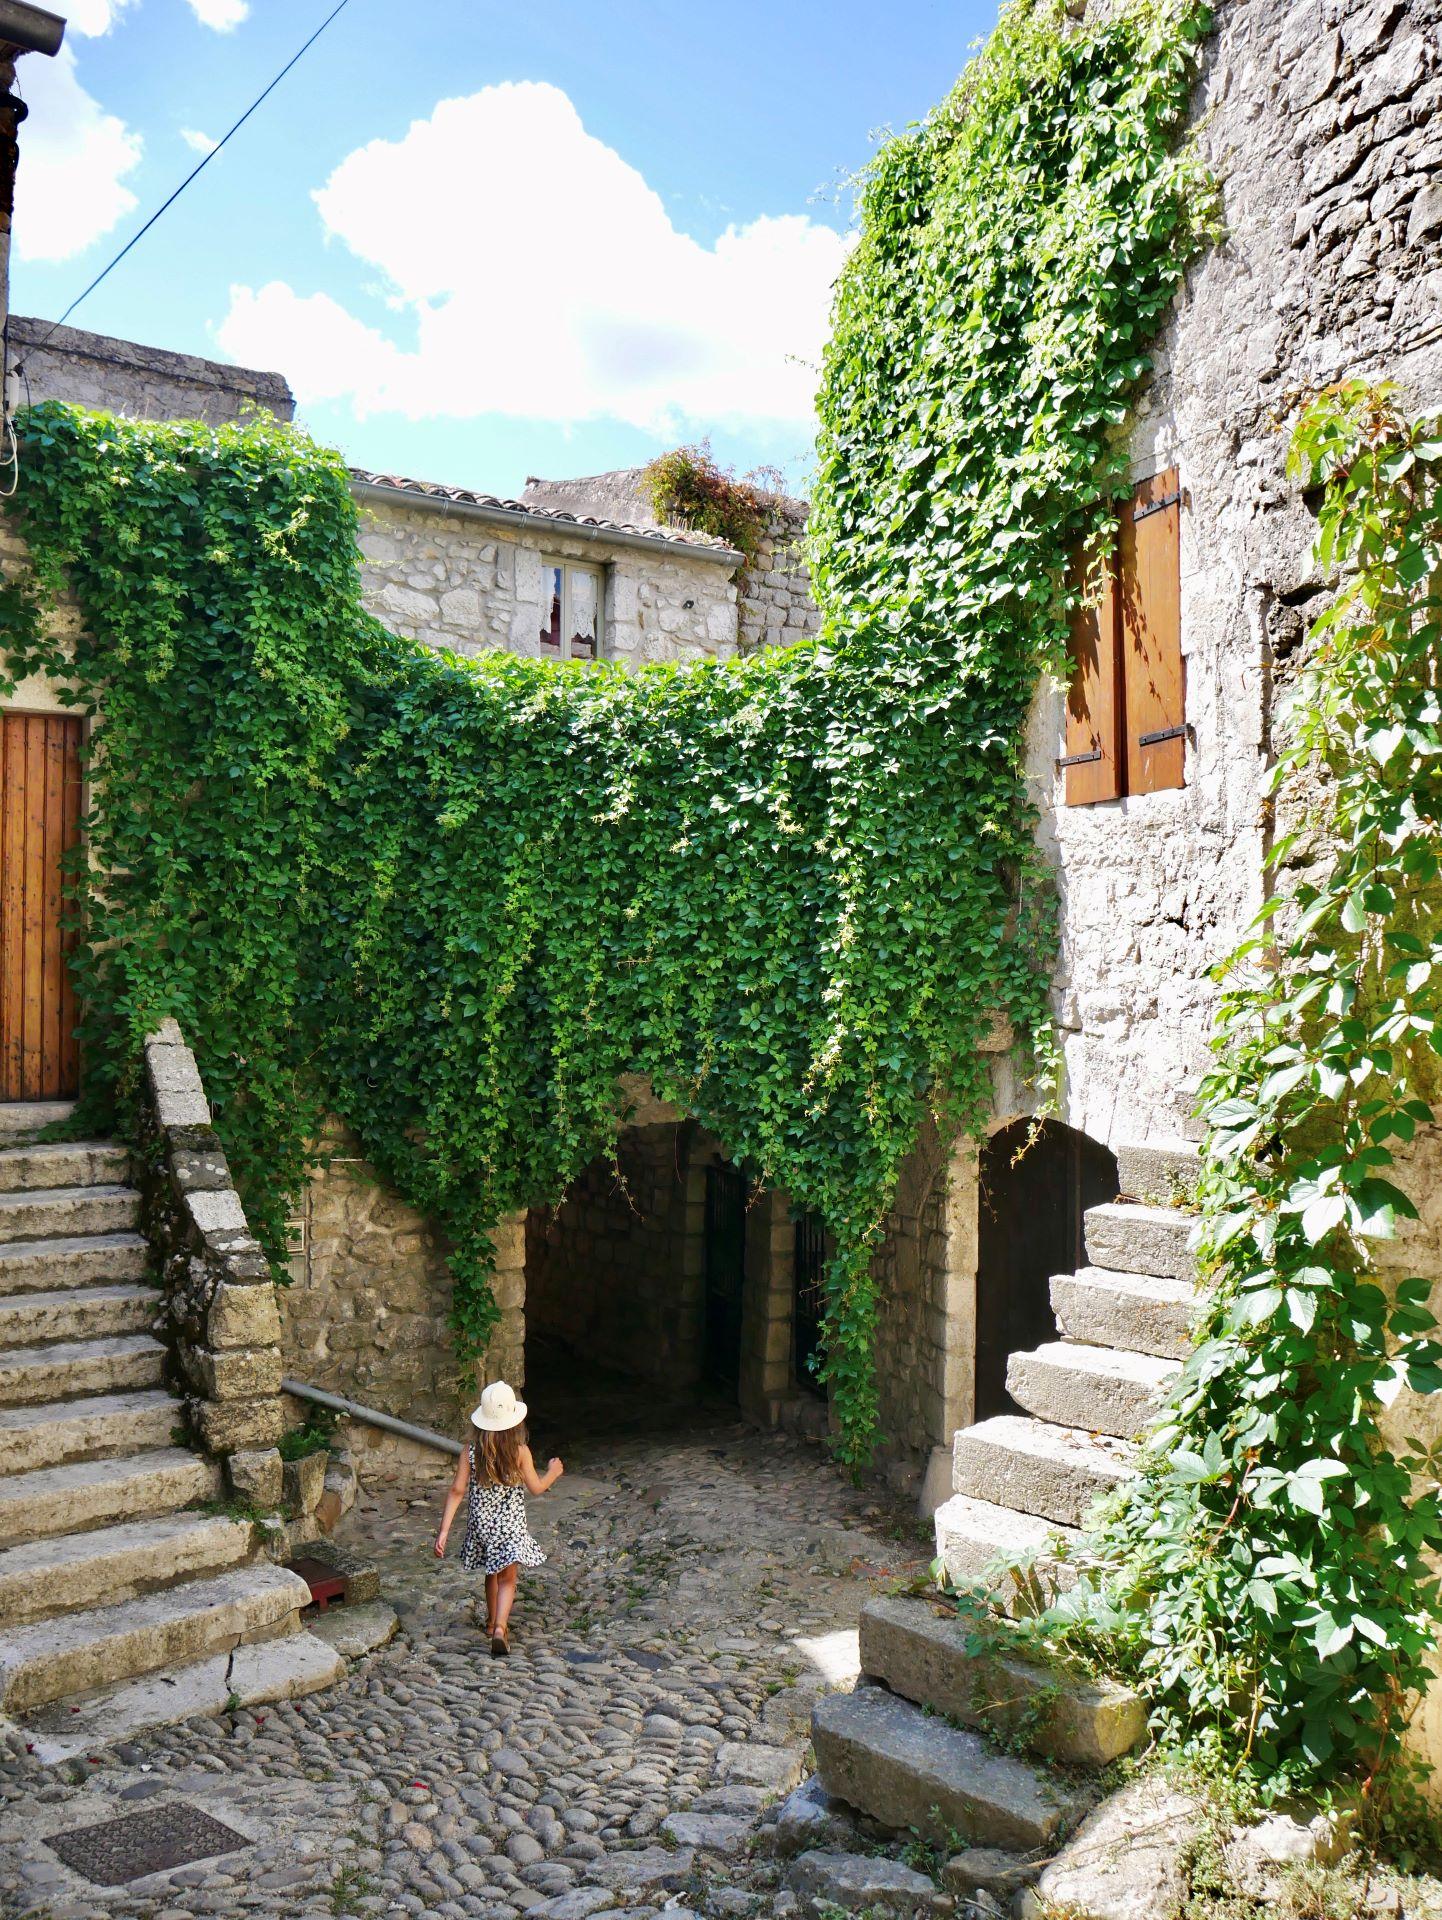 balade en Ardèche : Balazuc, petite place pavée